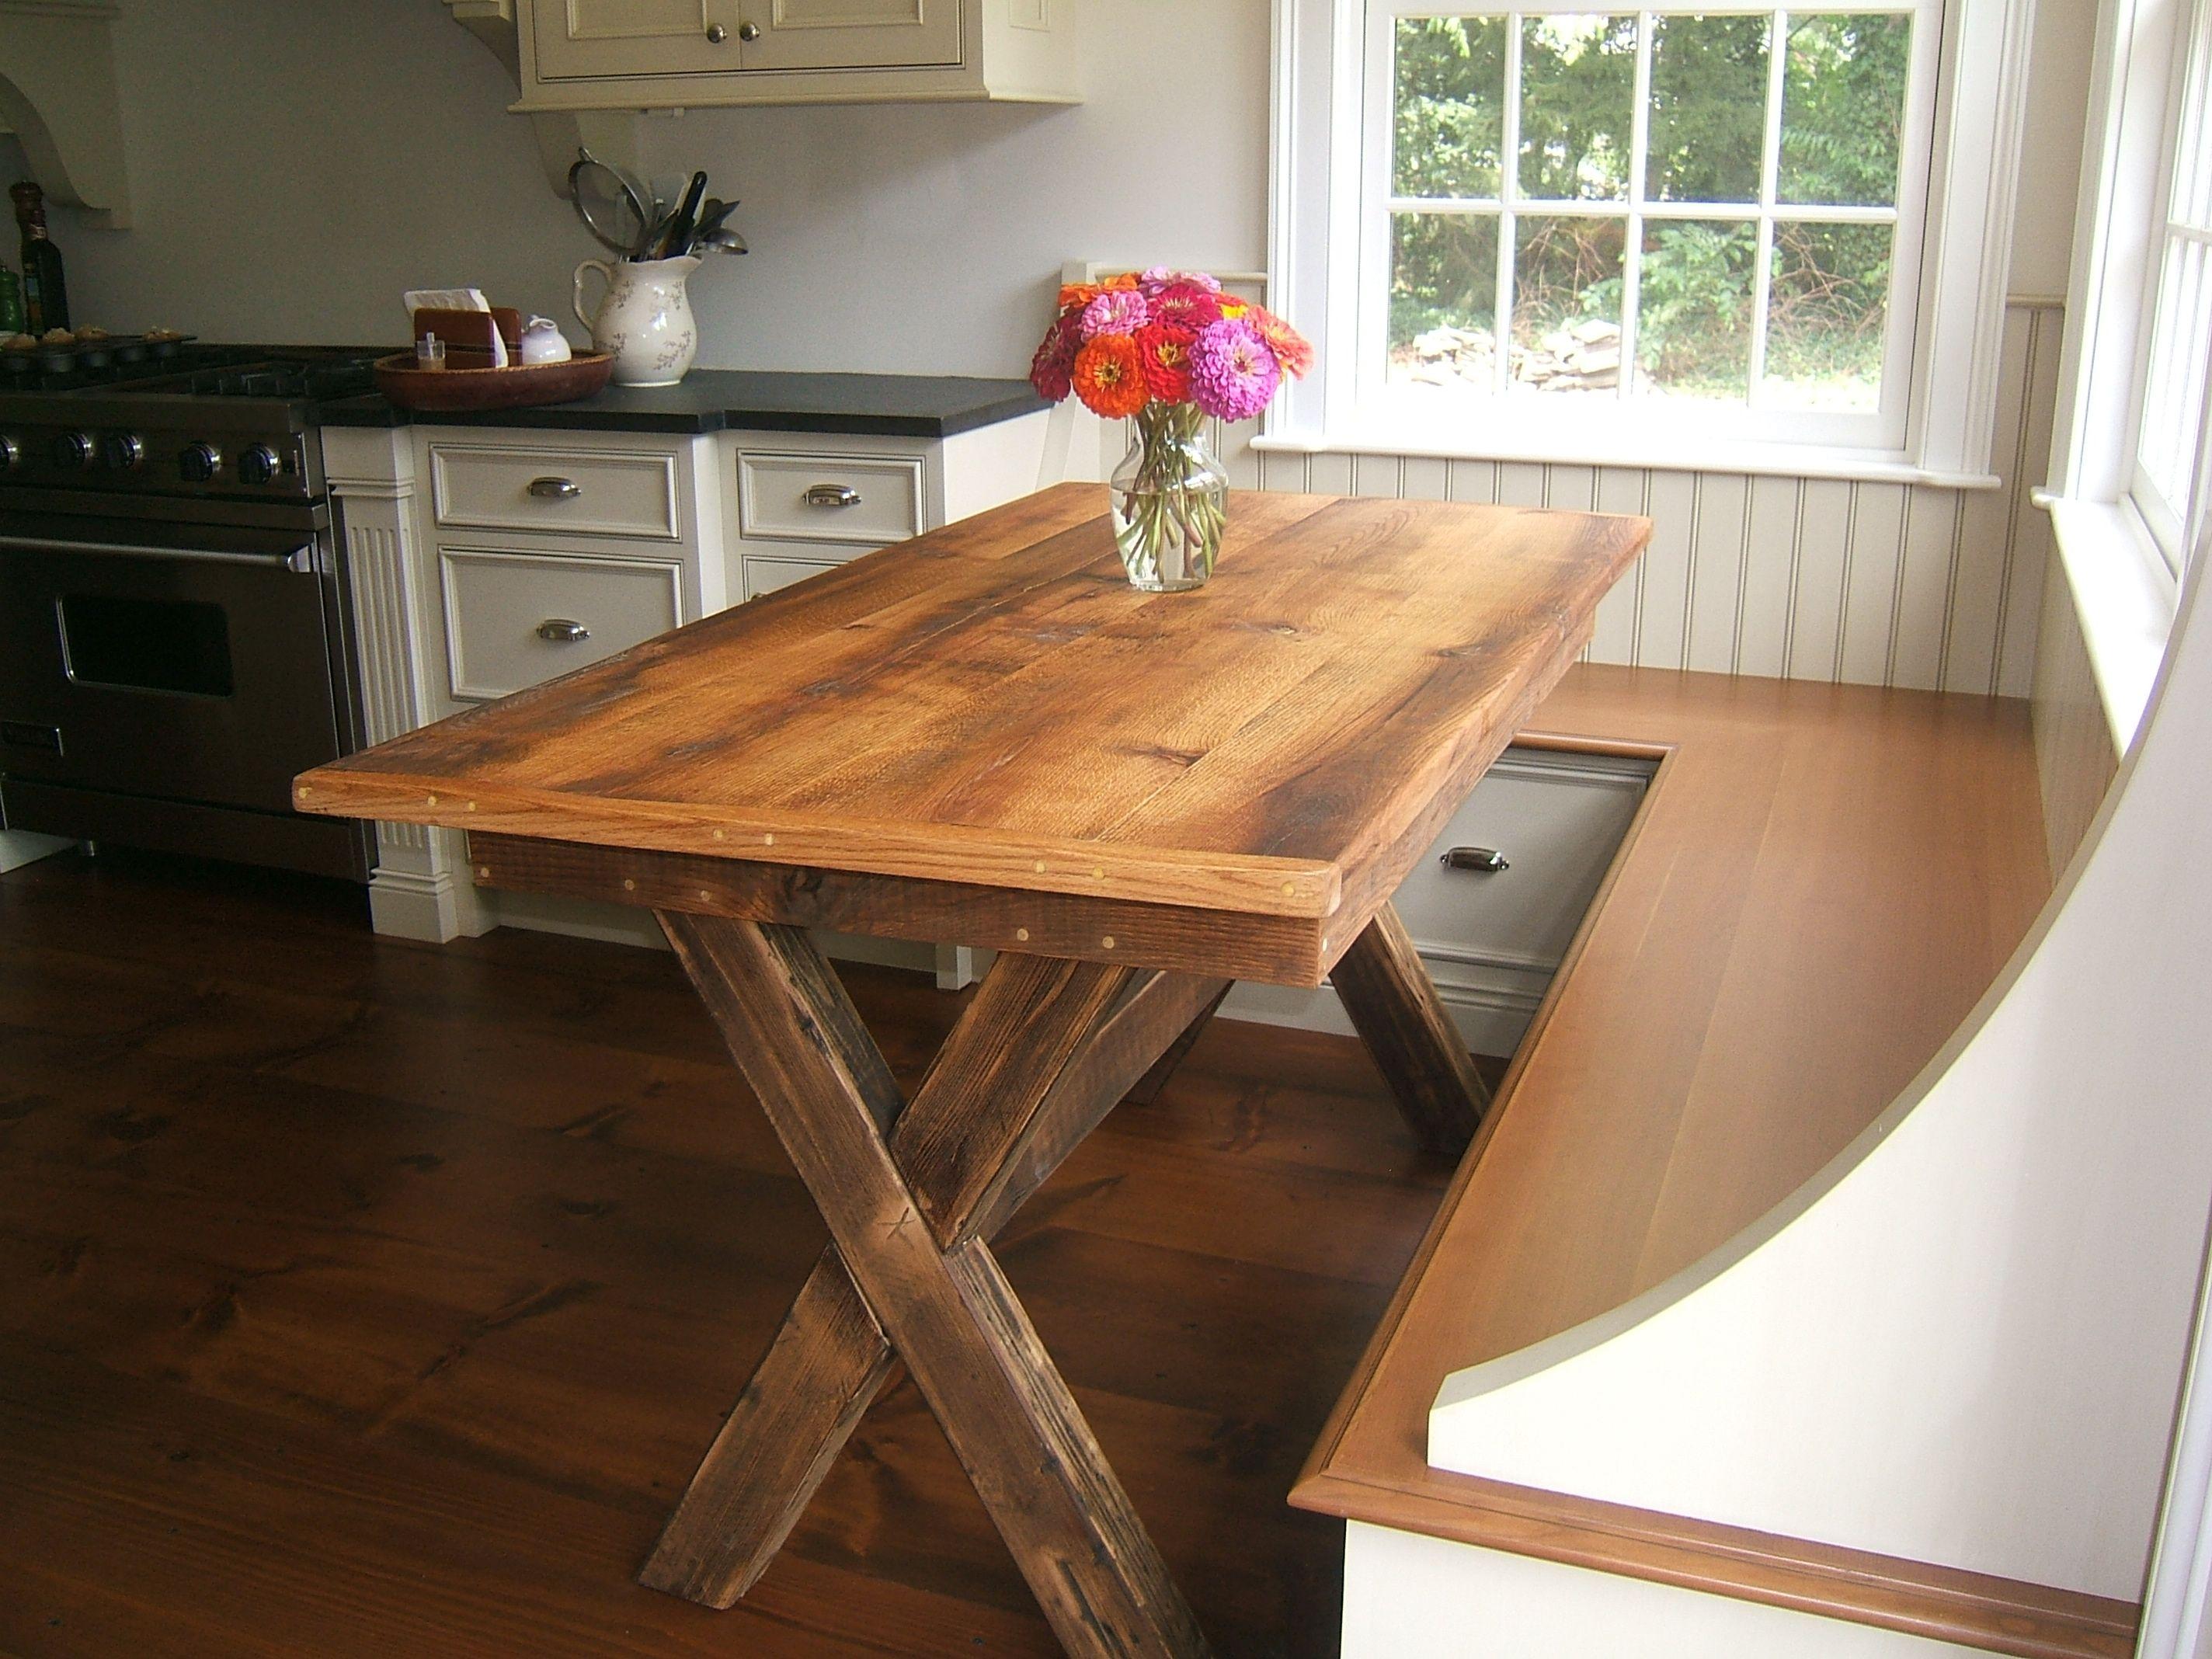 Counter Height Trestle Table | BobReutersTL.com